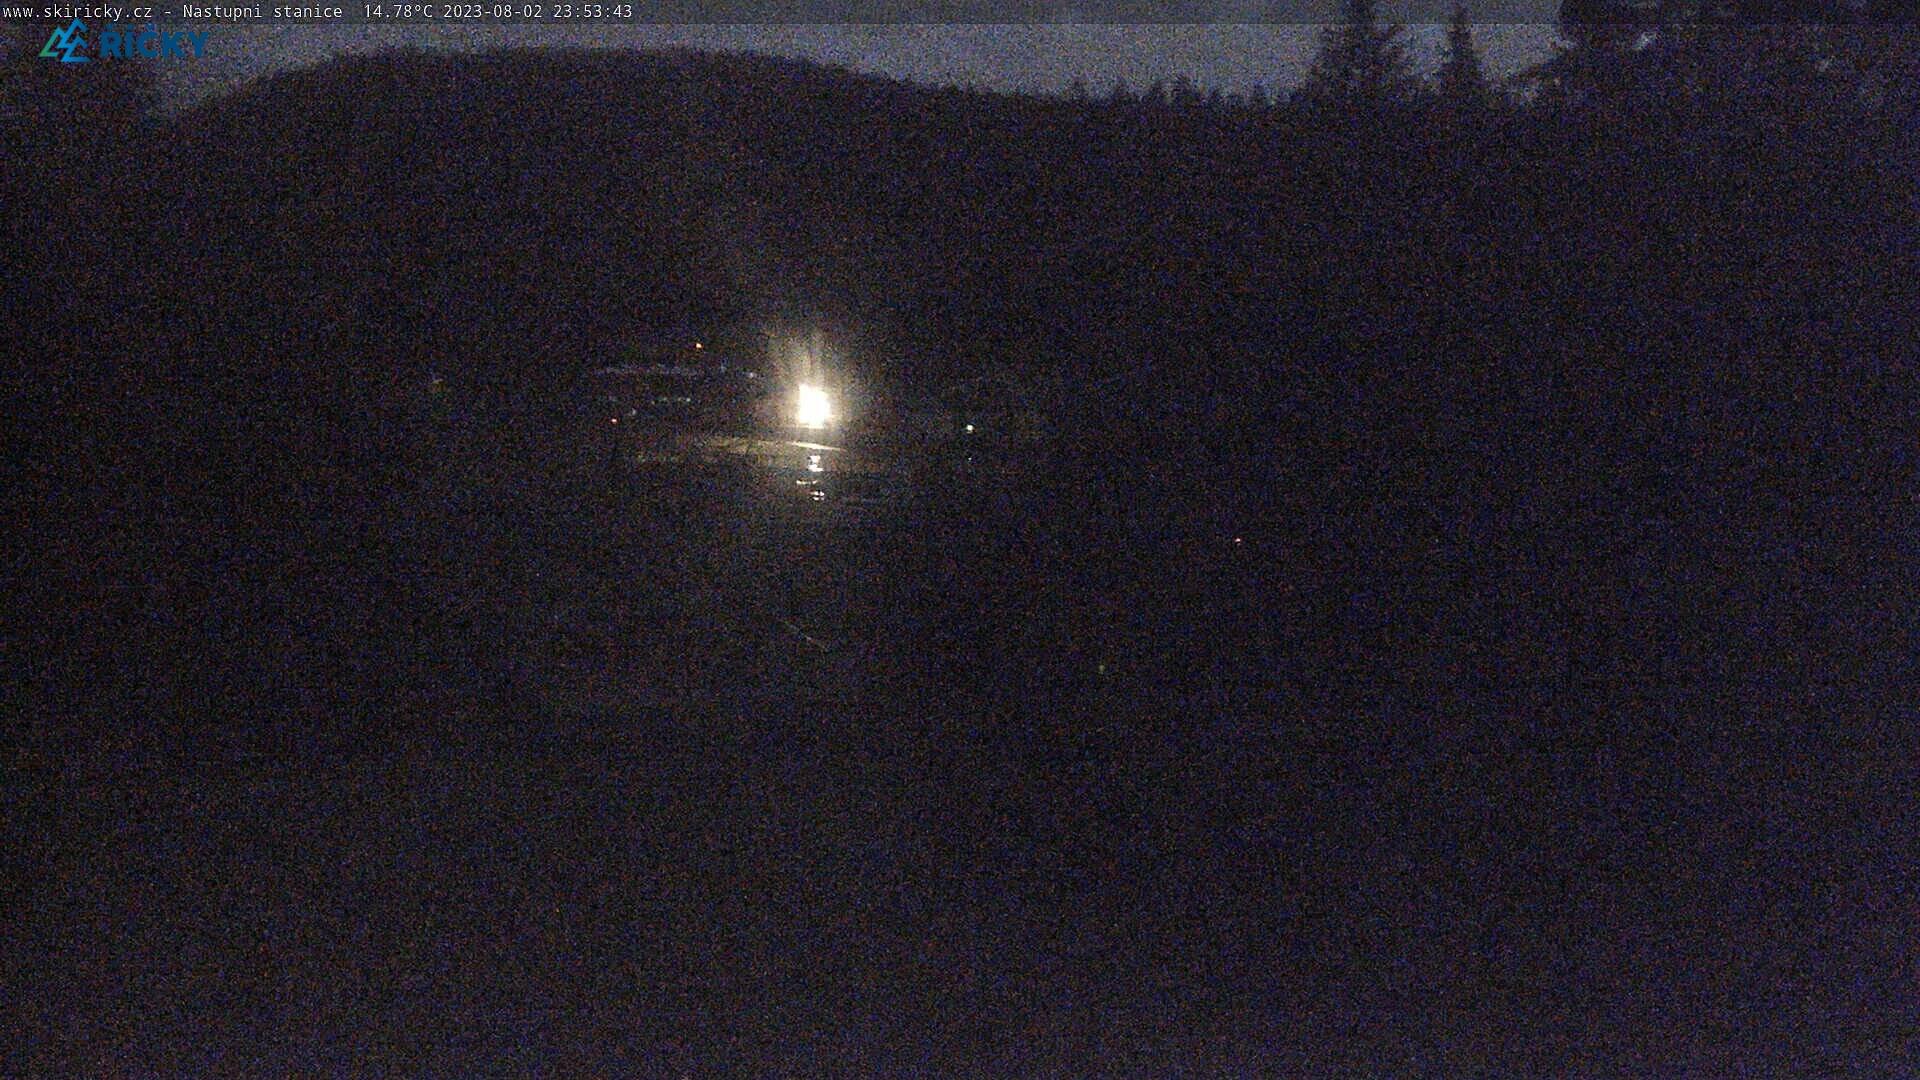 Webcam Ski Resort Ricky v O.h. cam 2 - Eagle Mountains